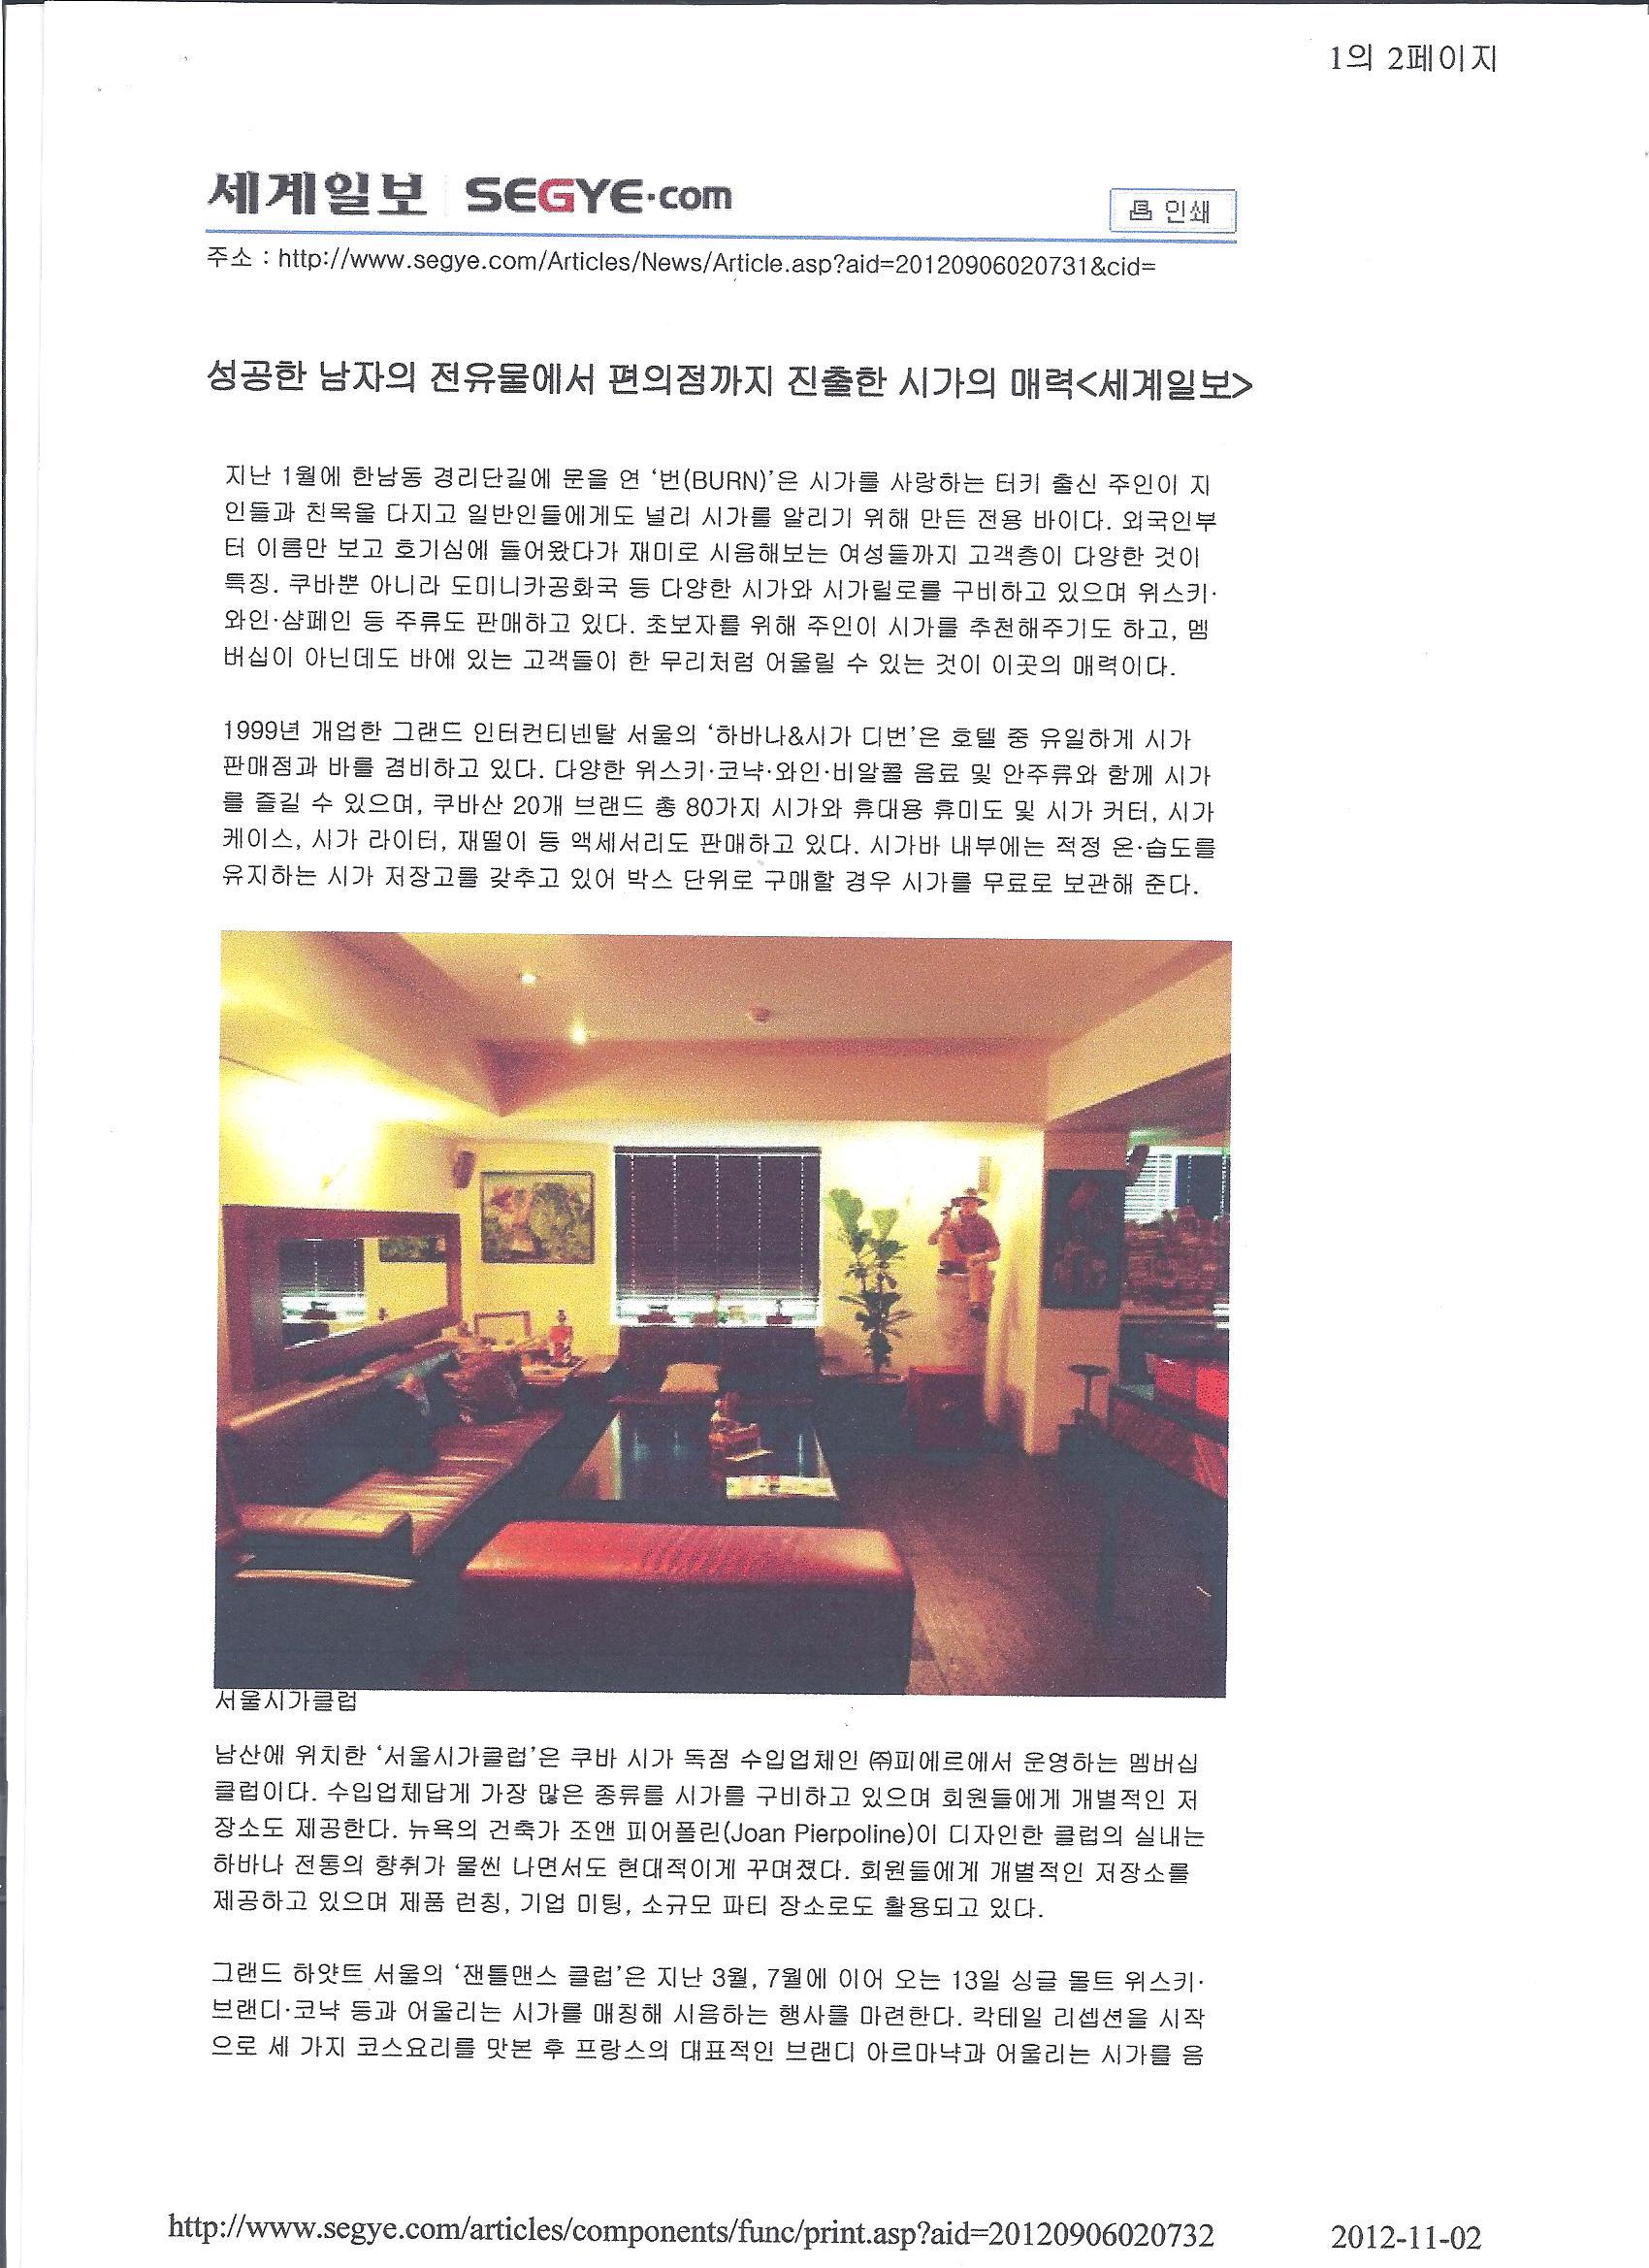 2012-9 Segye article 4.jpg